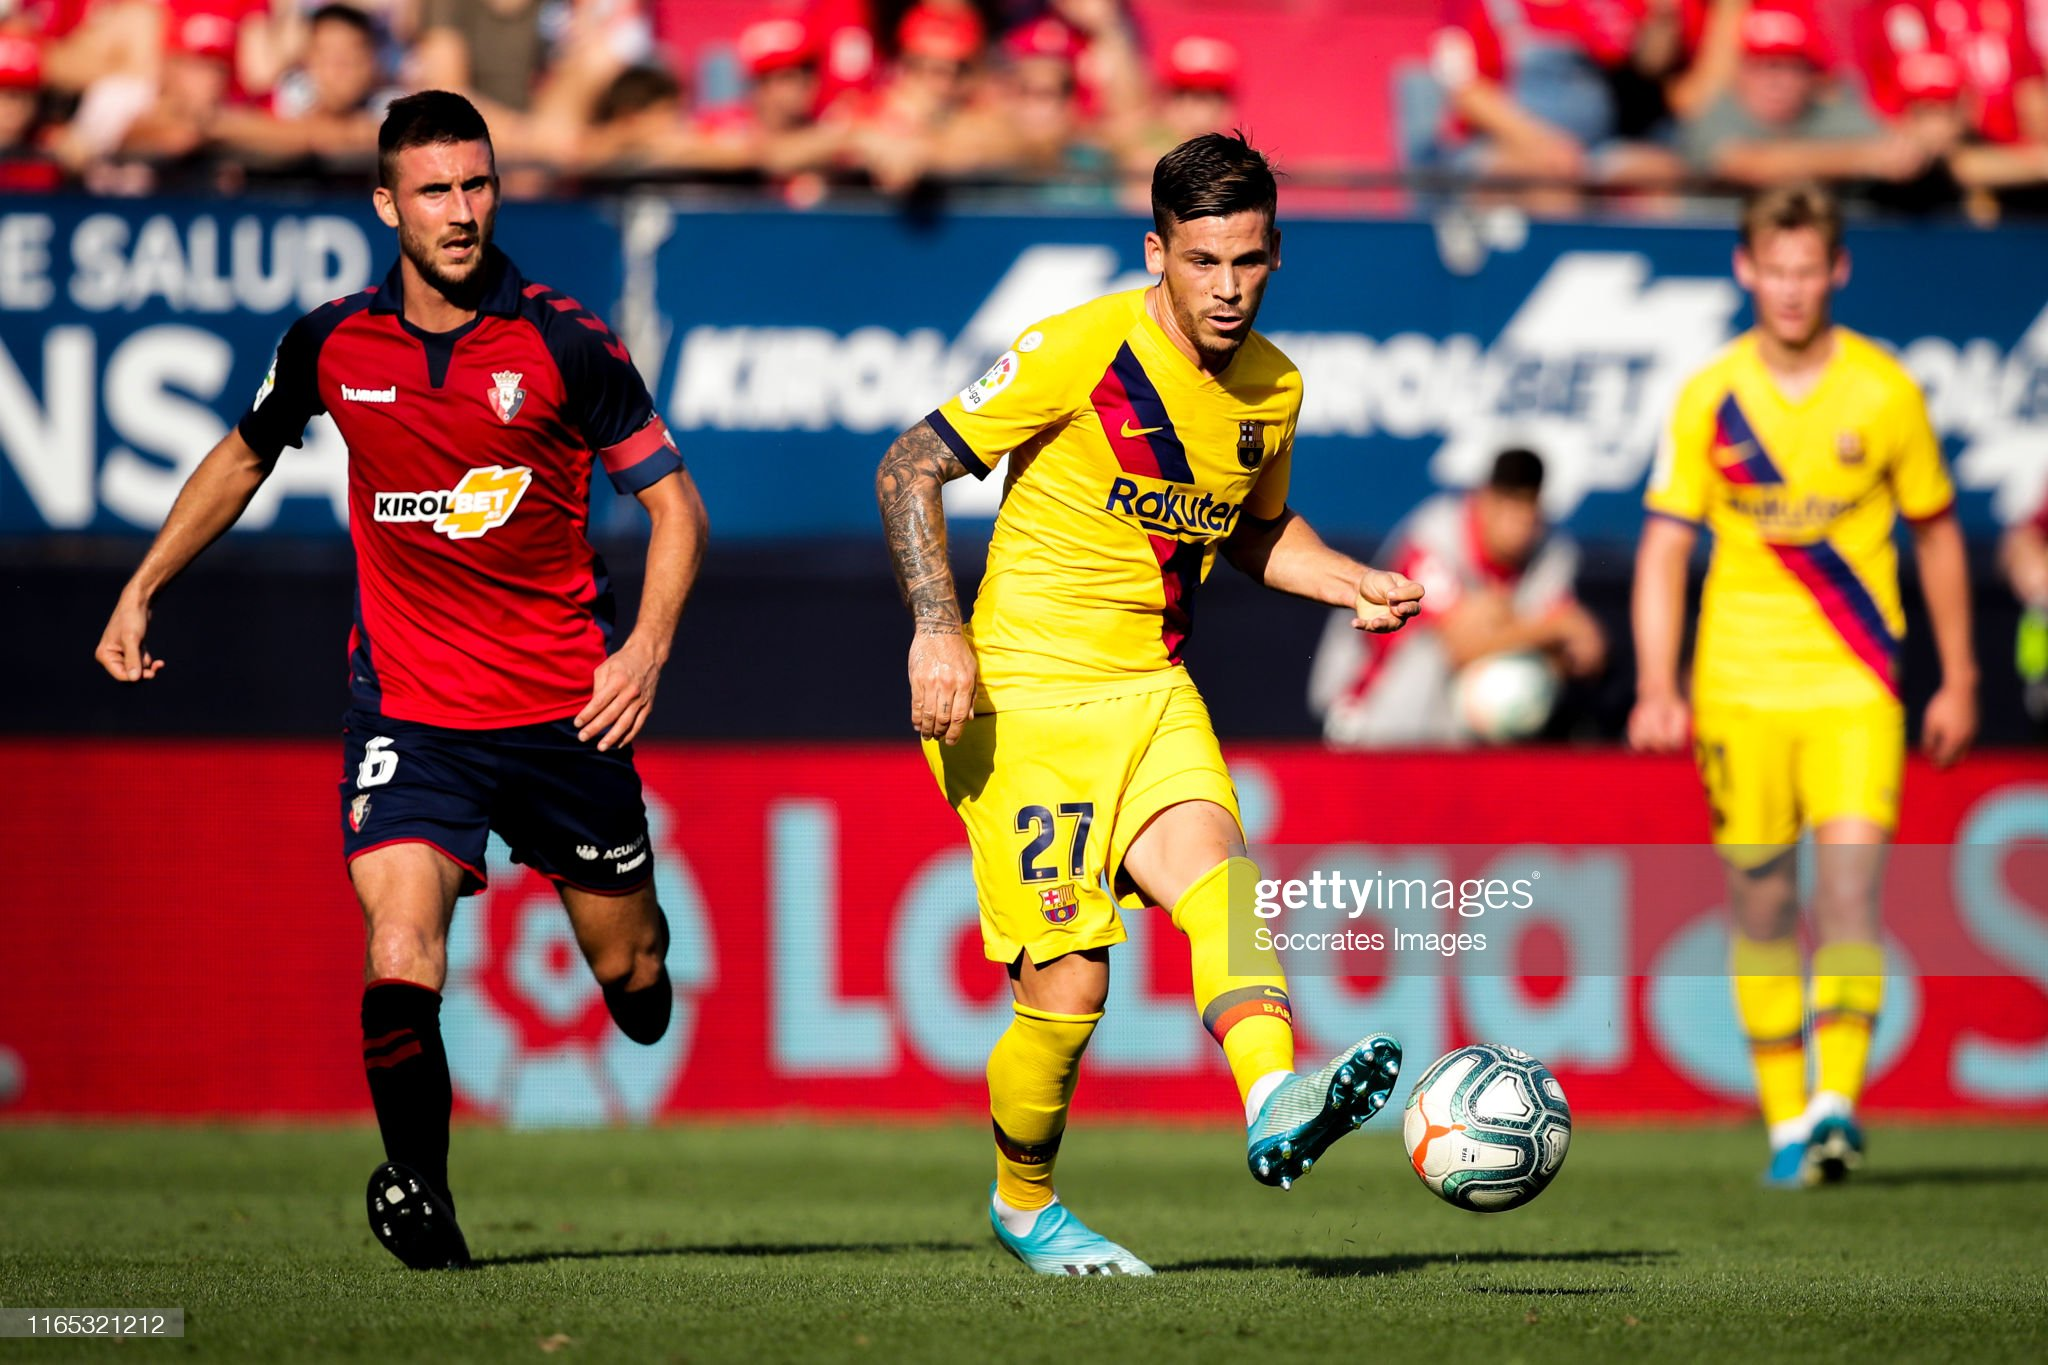 صور مباراة : أوساسونا - برشلونة 2-2 ( 31-08-2019 )  Carles-perez-of-fc-barcelona-during-the-la-liga-santander-match-v-picture-id1165321212?s=2048x2048